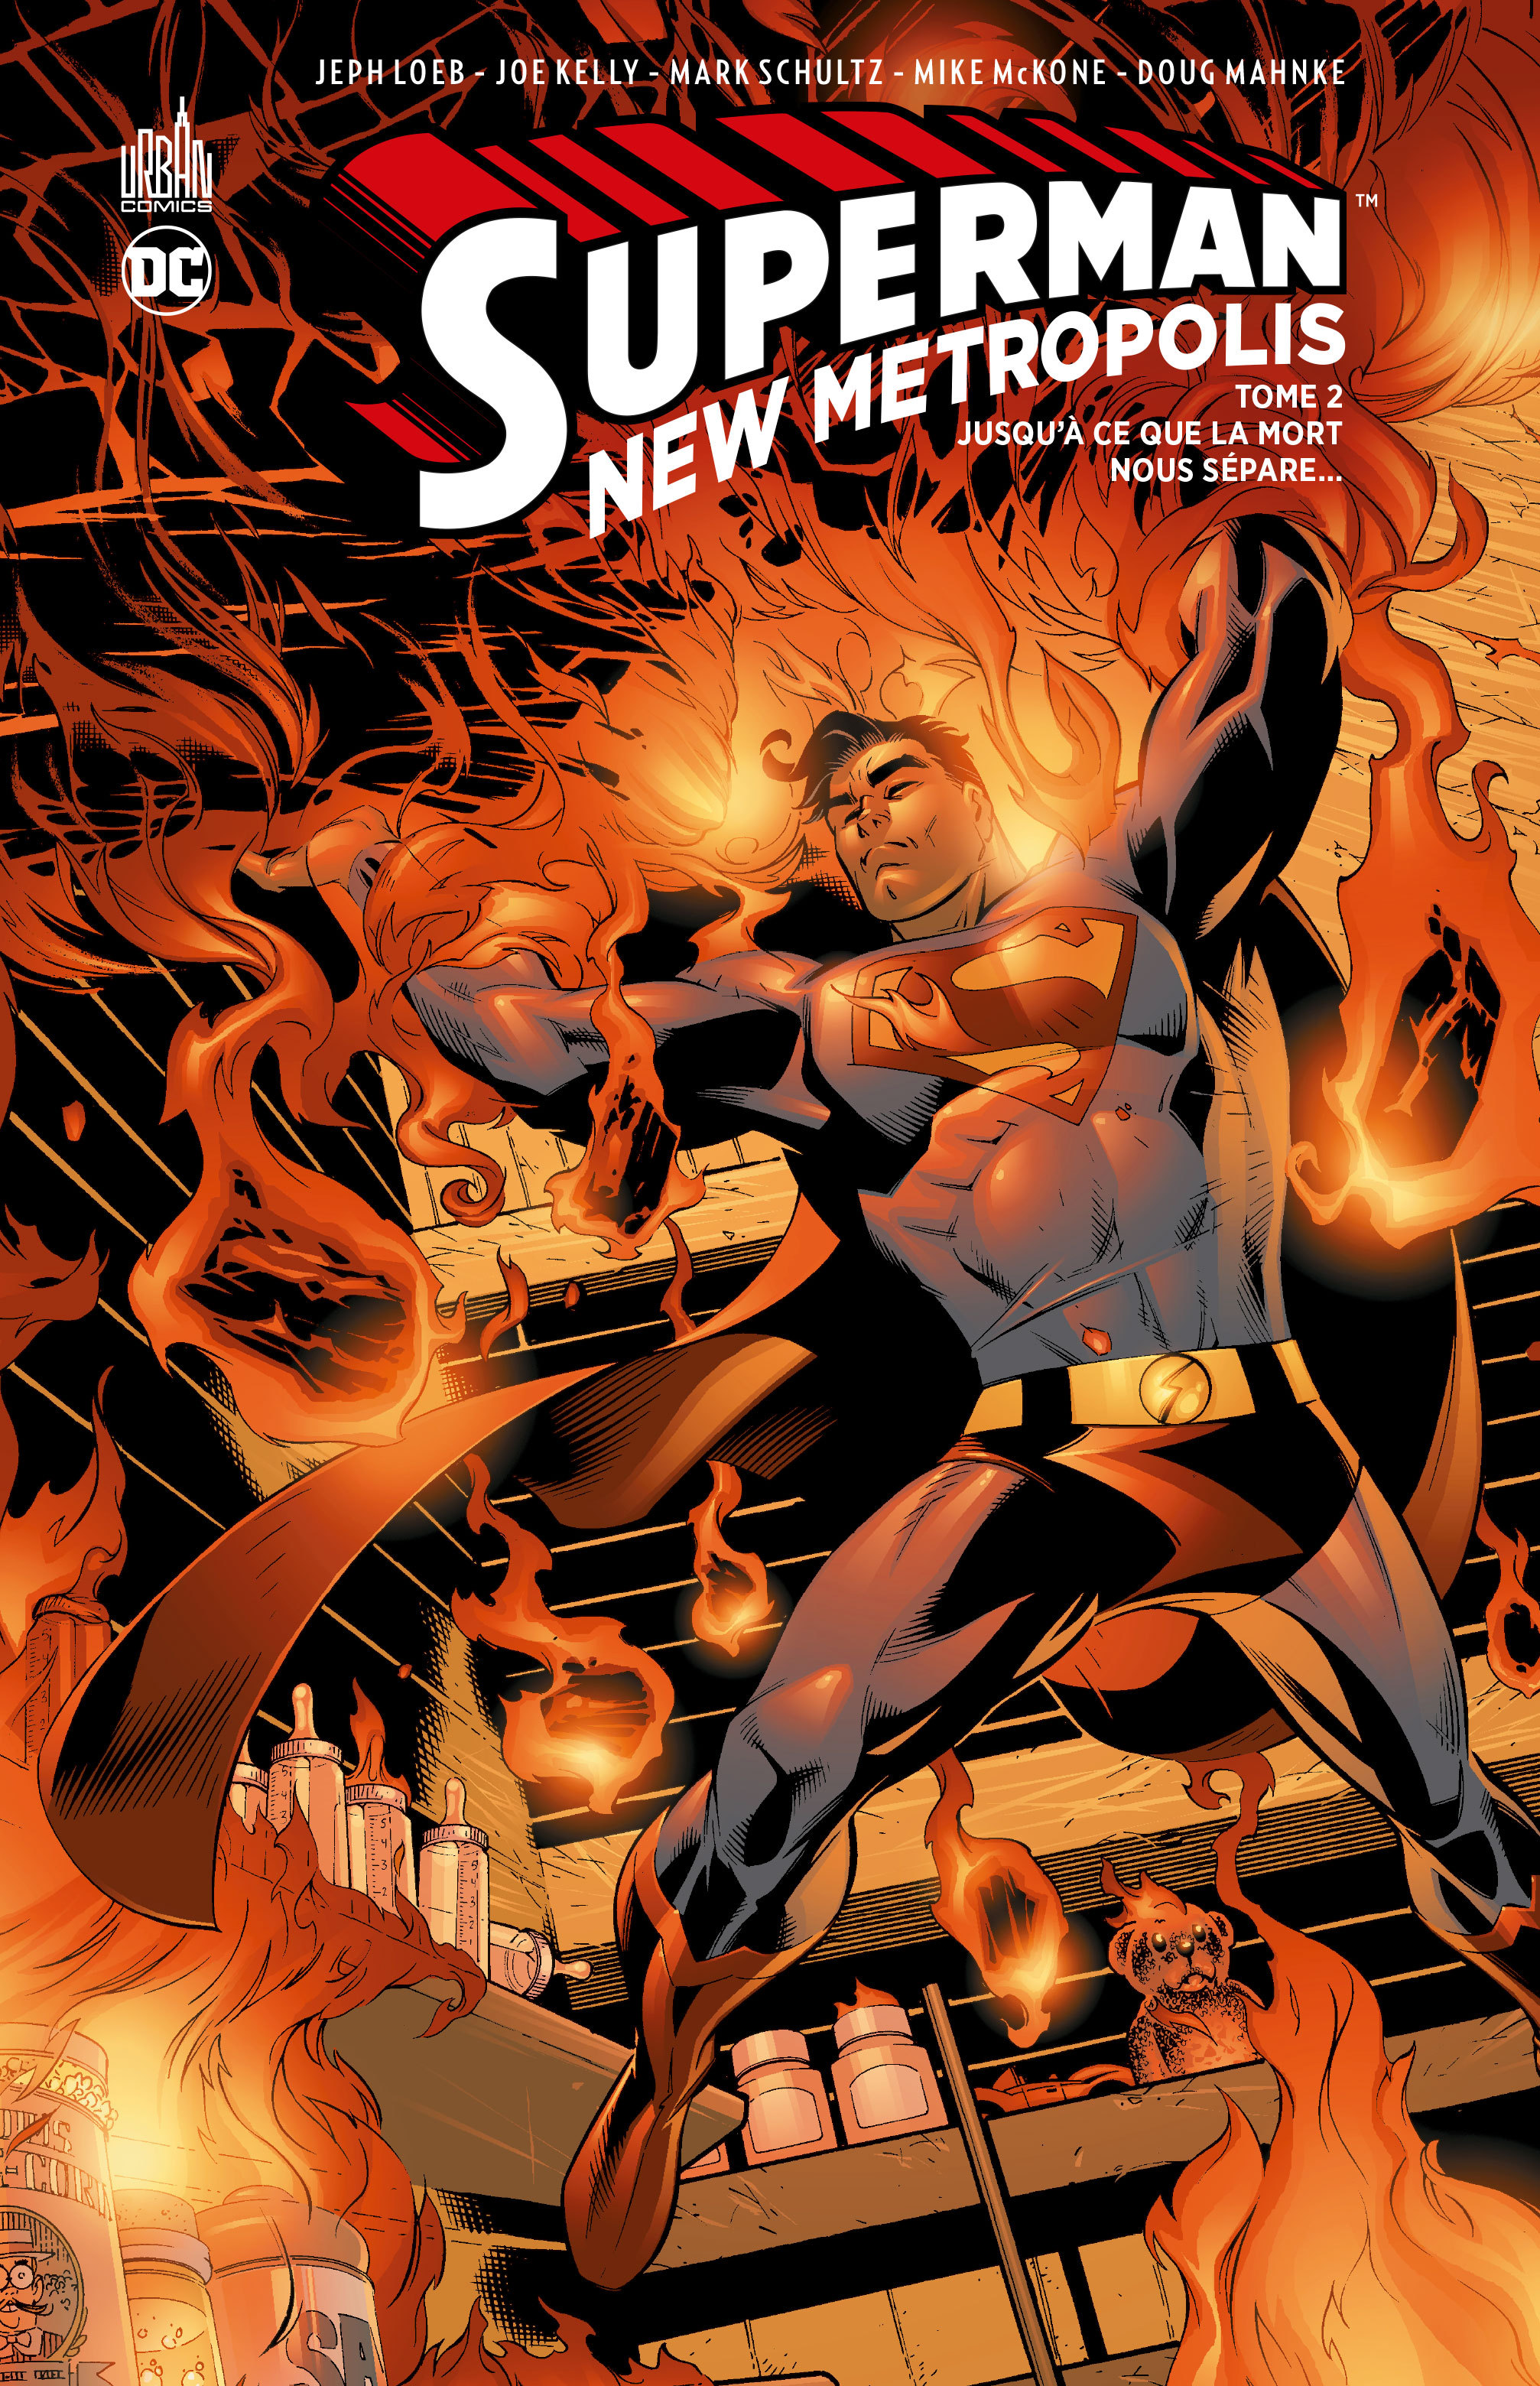 DC CLASSIQUES - SUPERMAN - NEW METROPOLIS TOME 2